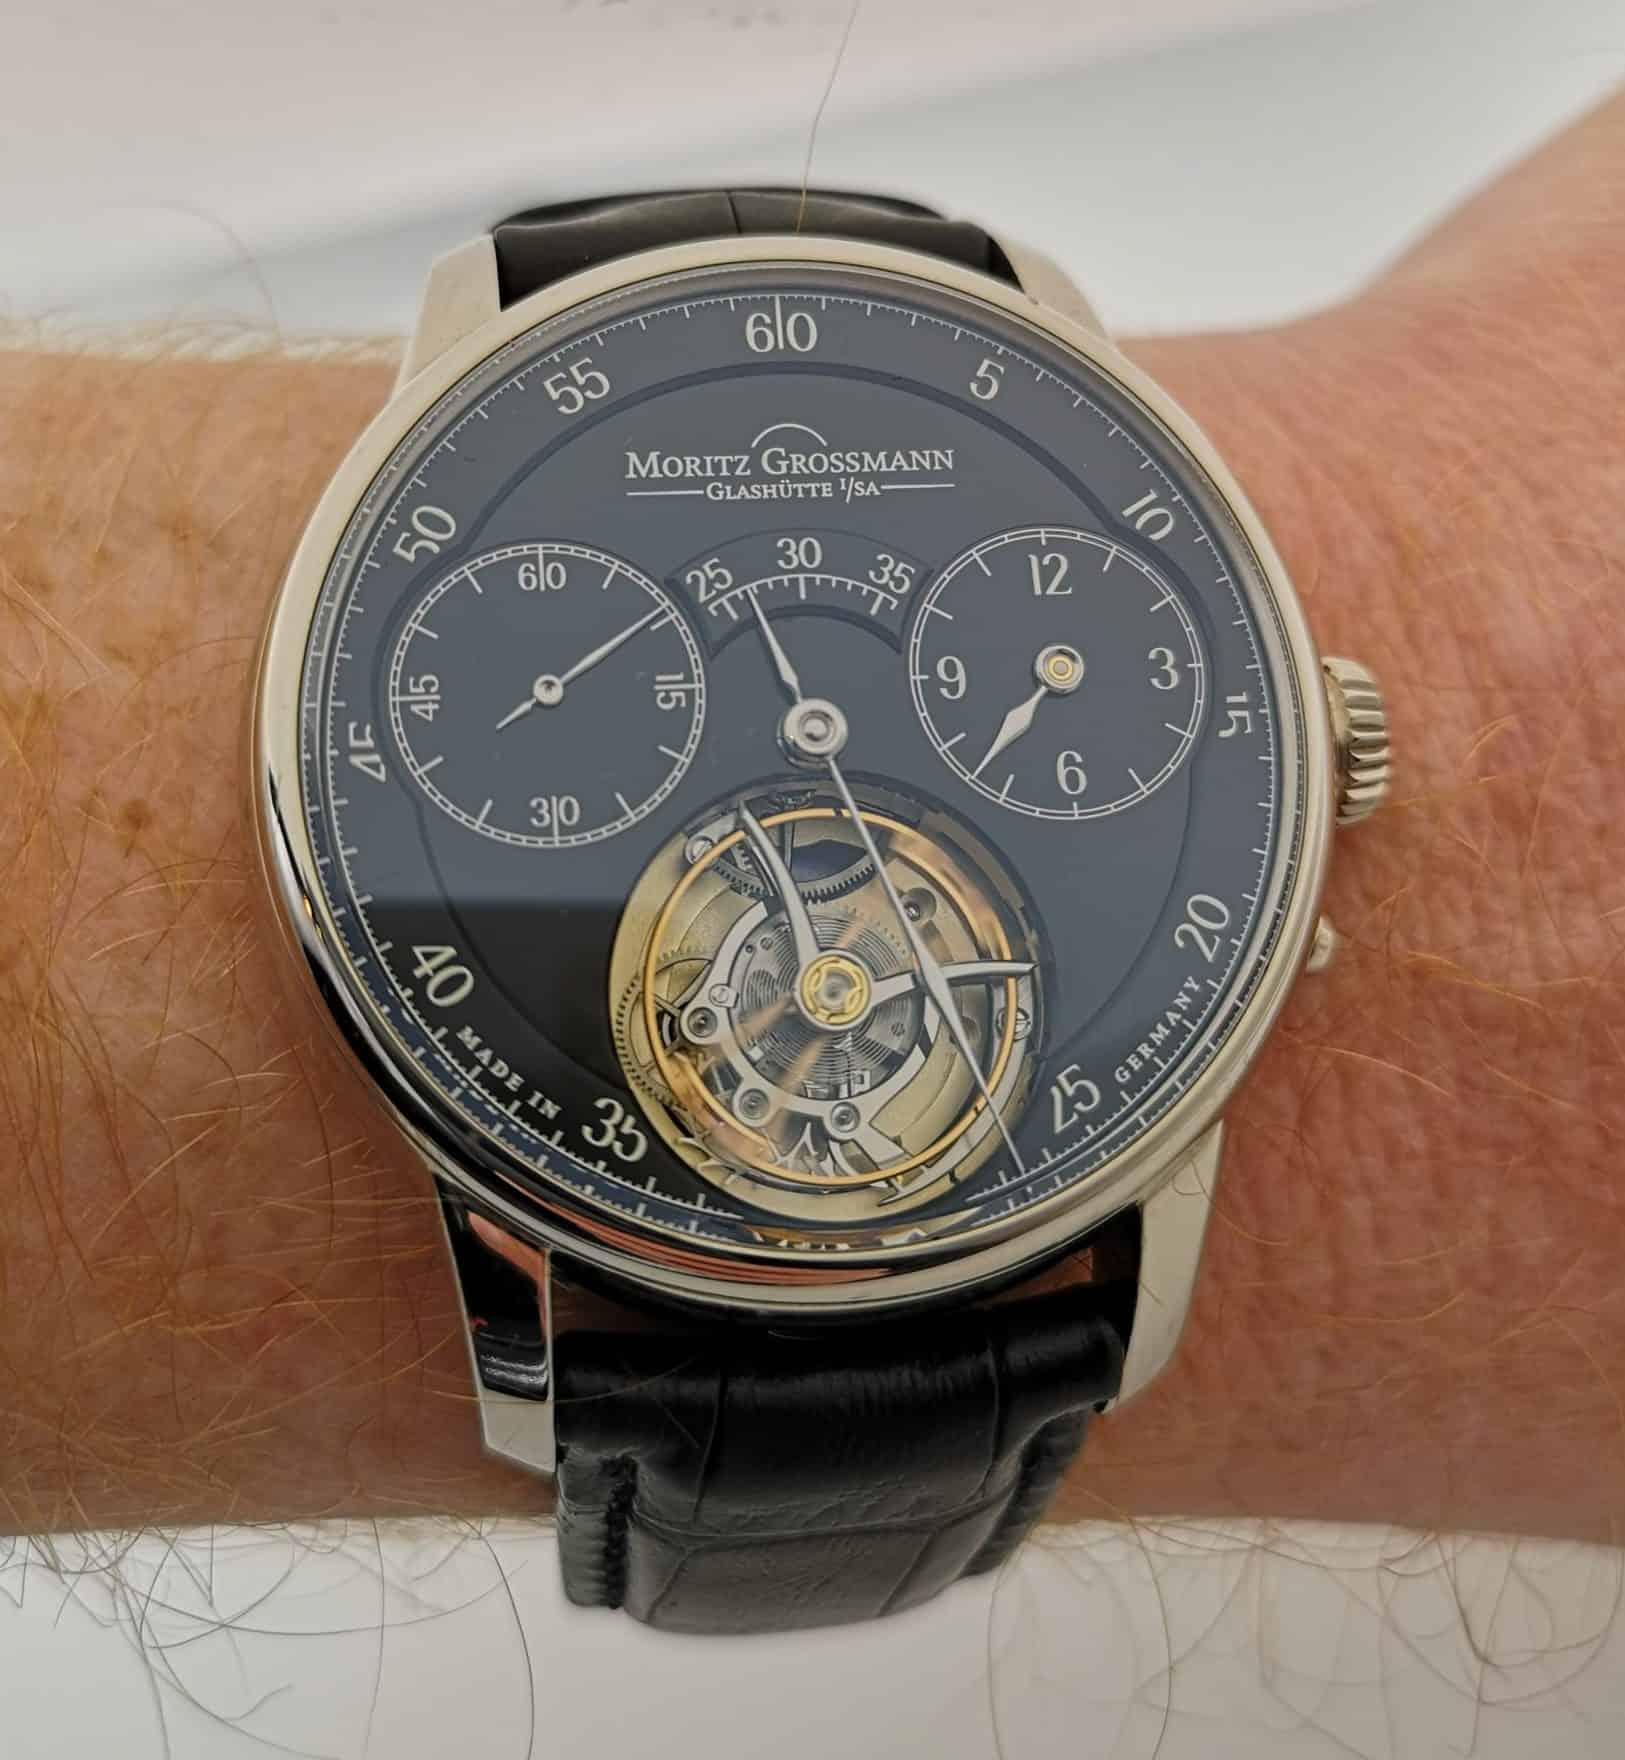 Moritz Grossmann Benu Tourbillon on the Wrist